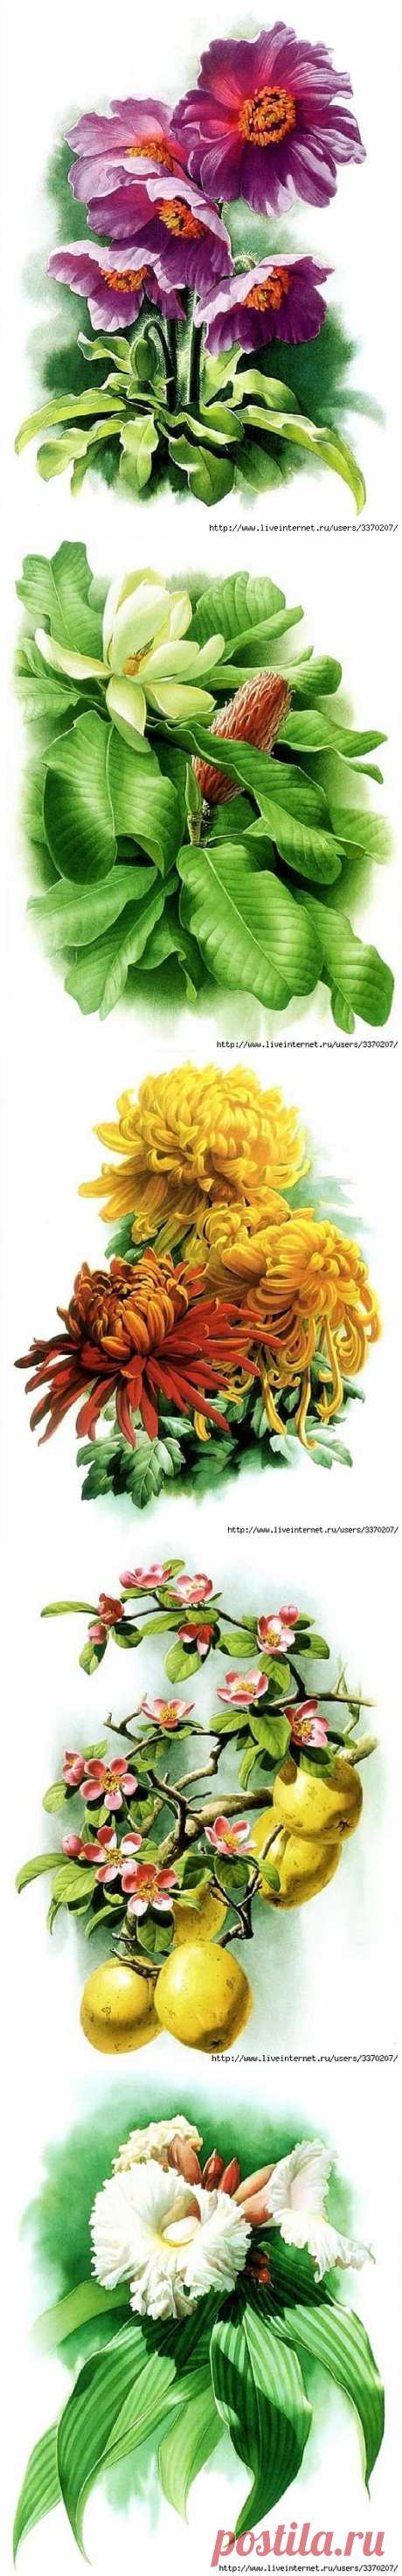 Цветы от Zeng Xiao Lian 2 часть..